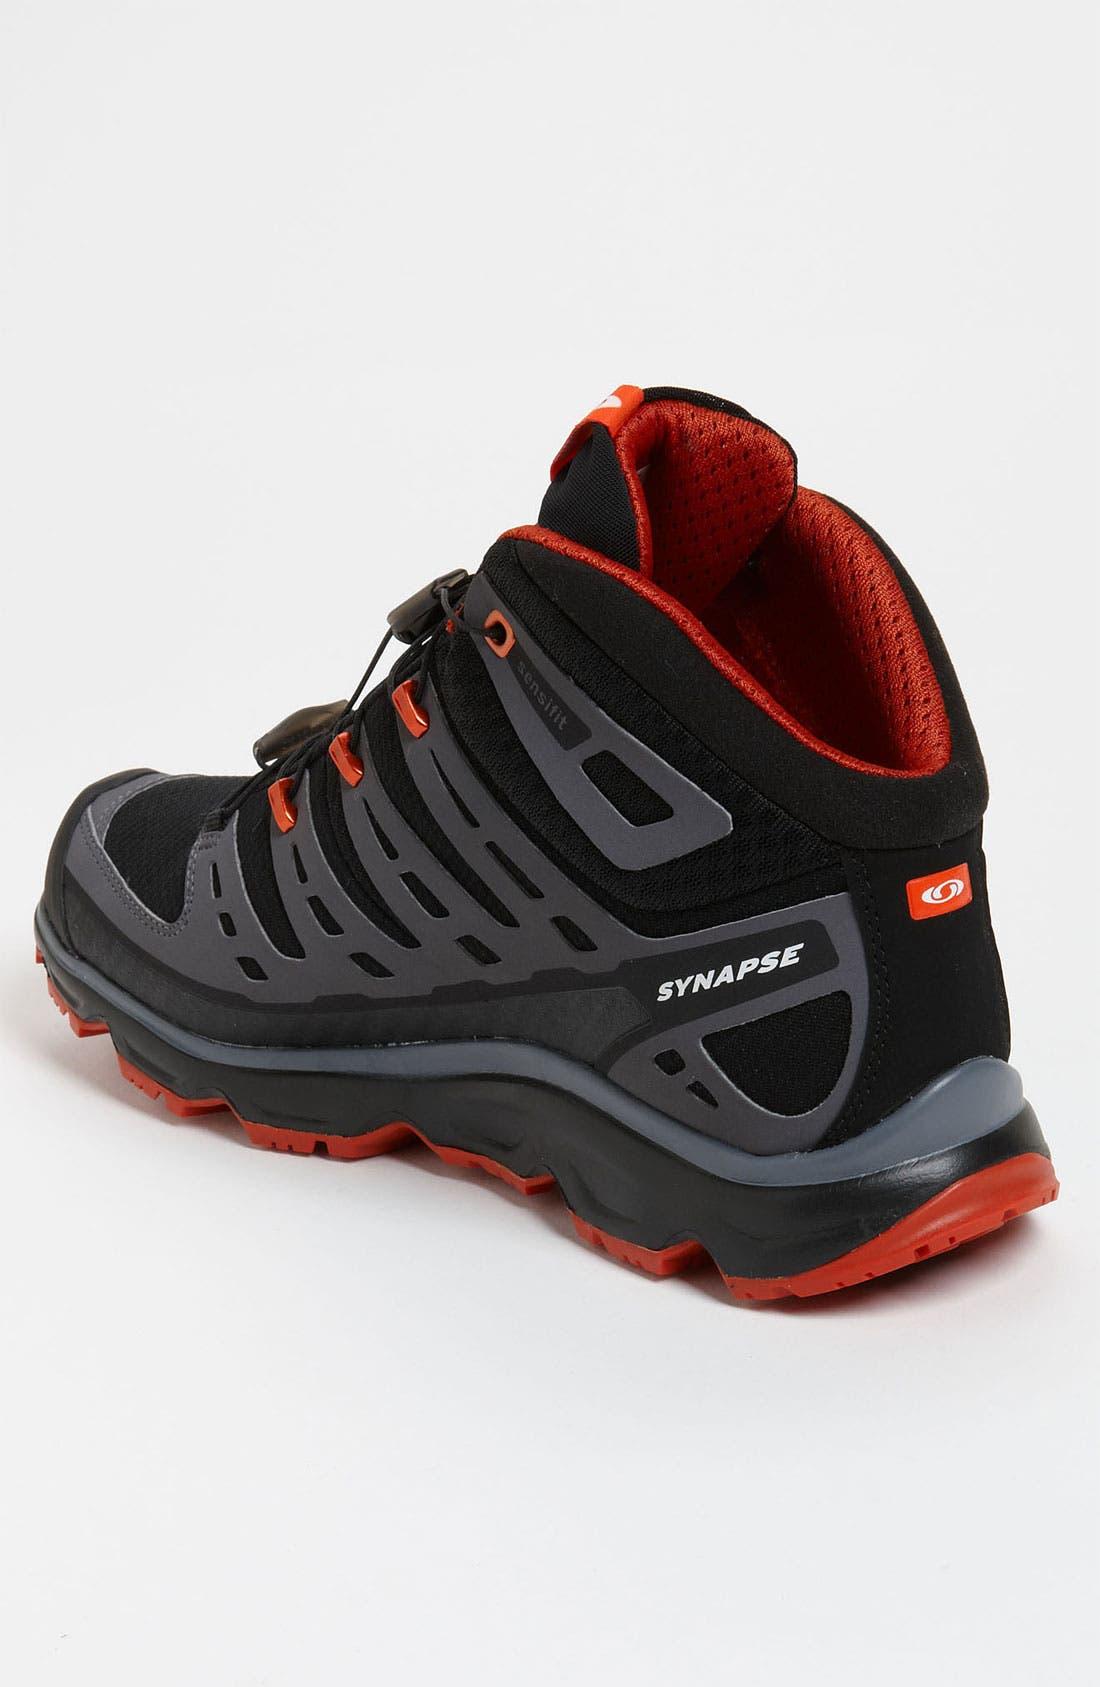 Alternate Image 2  - Salomon 'Synapse Mid CS' Hiking Shoe (Men) (Online Only)